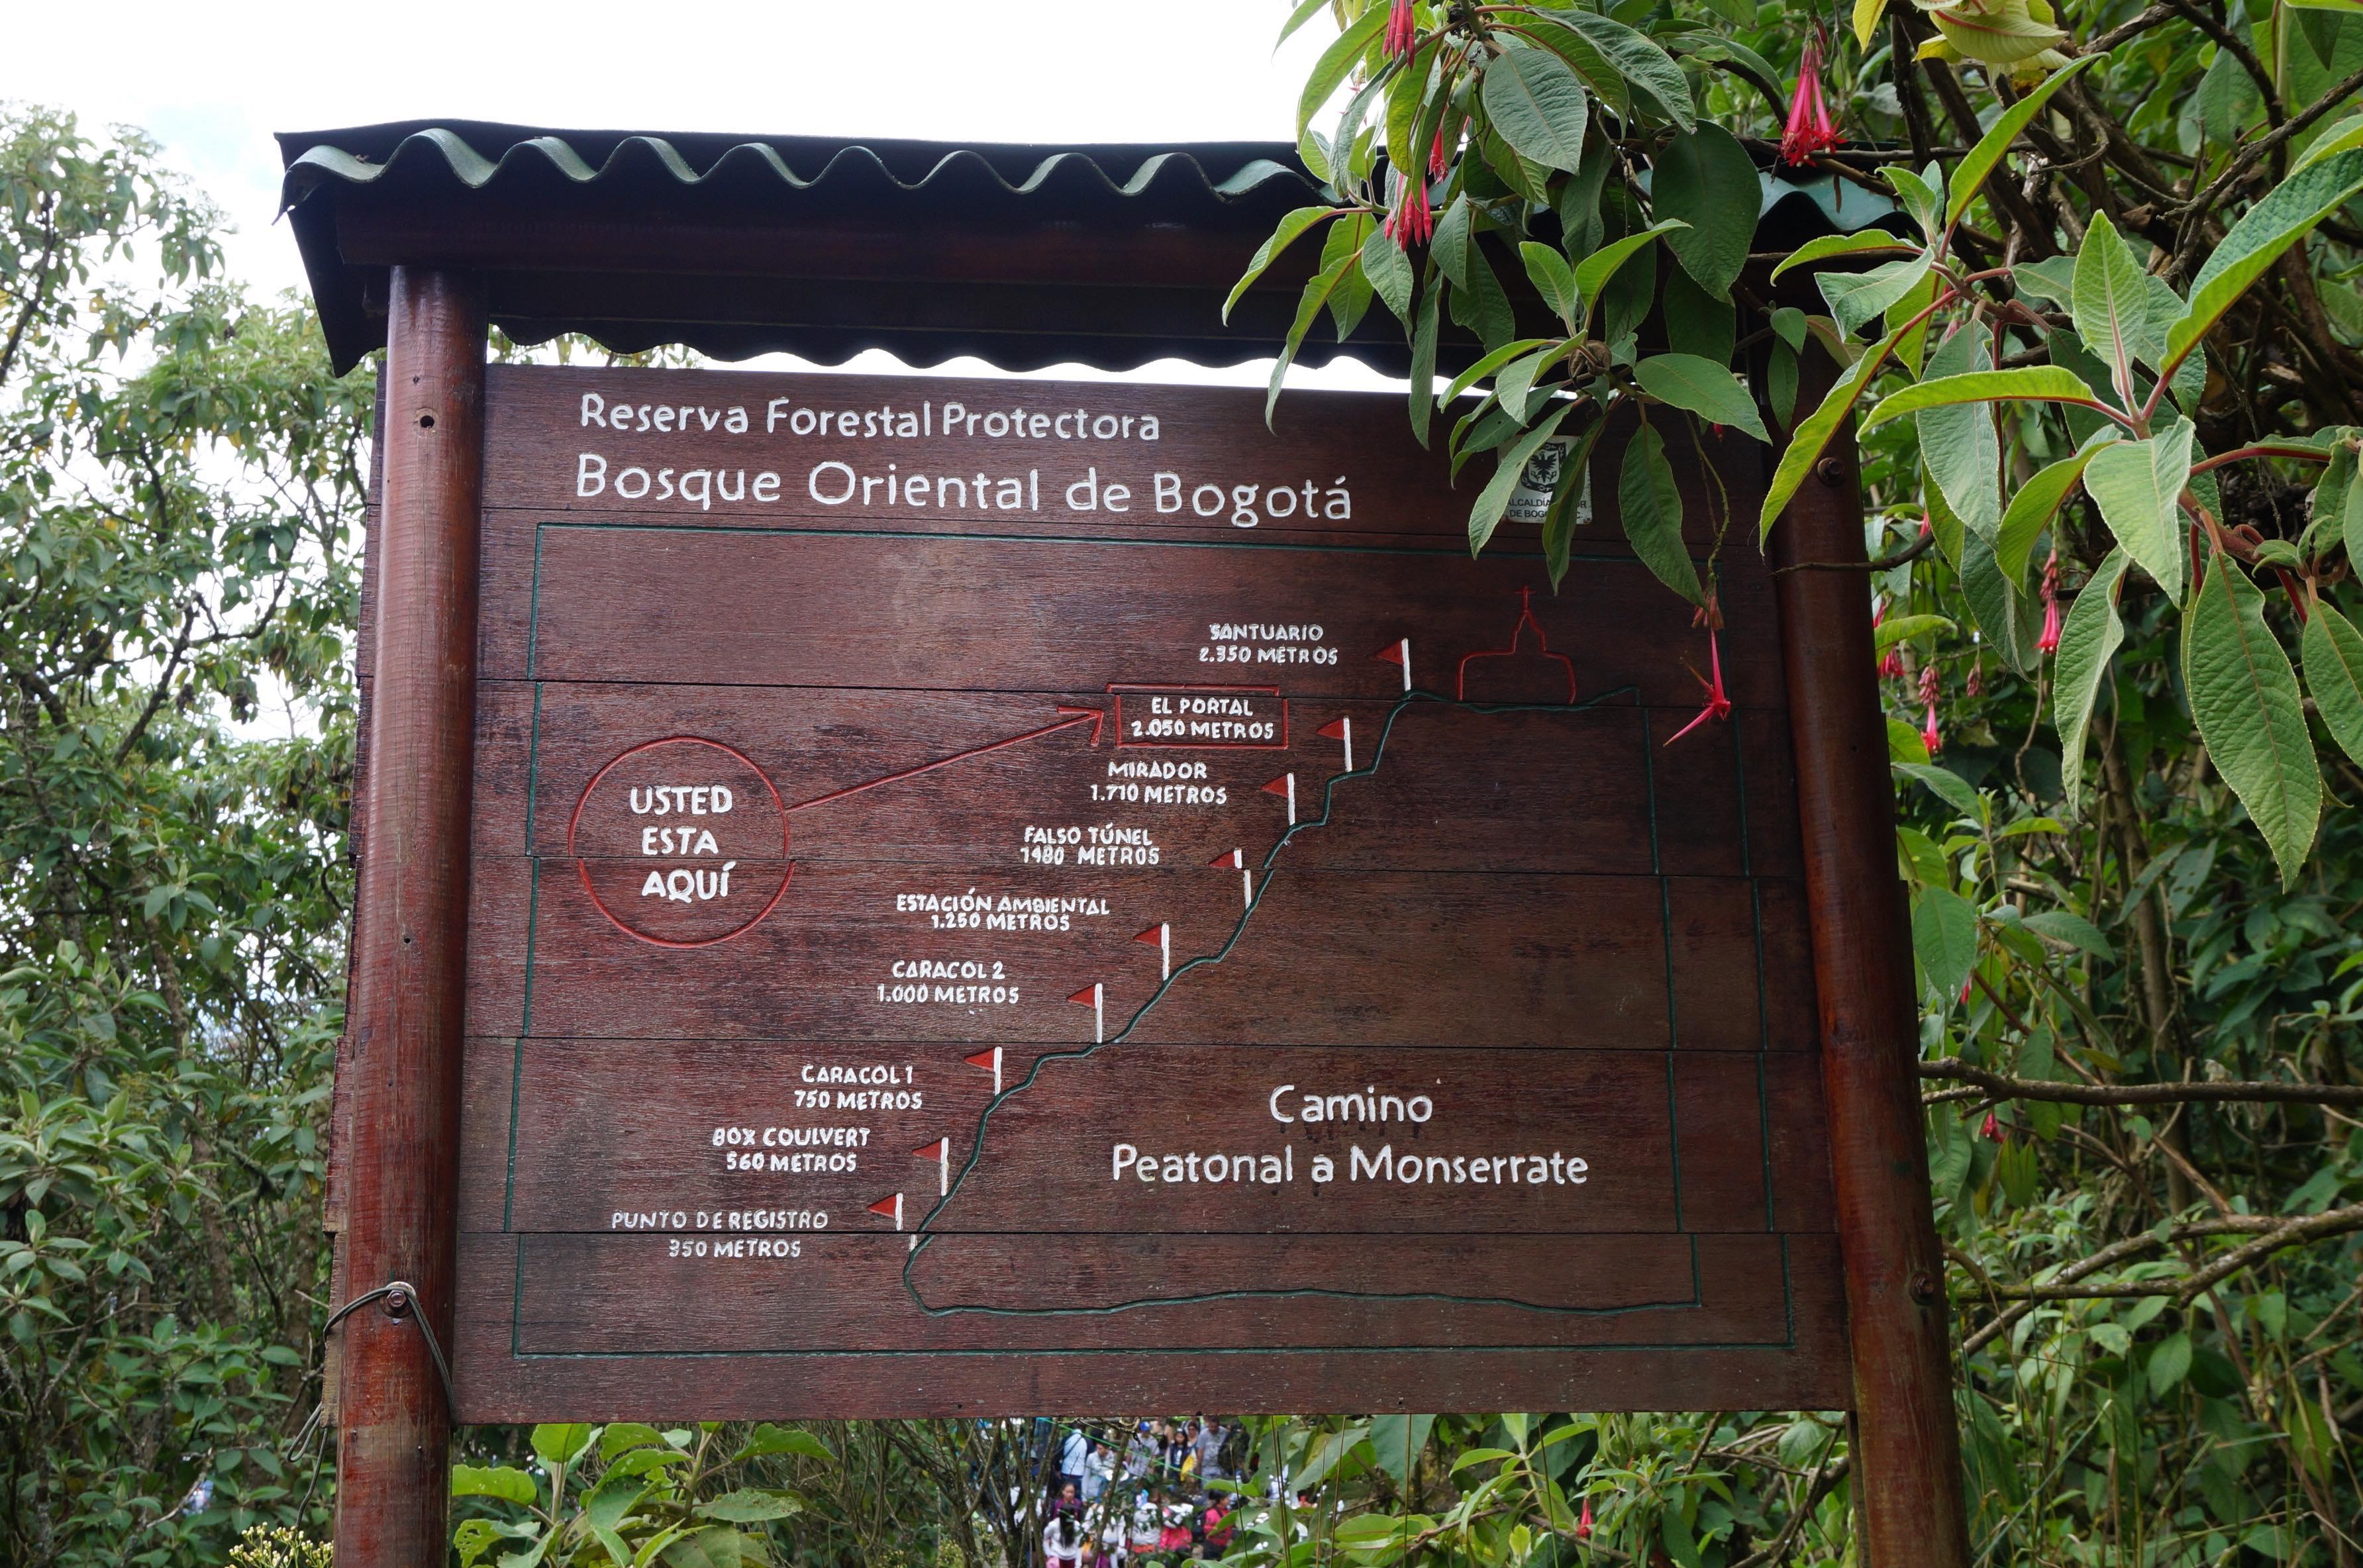 cerro de monteverde, colombie, bogota